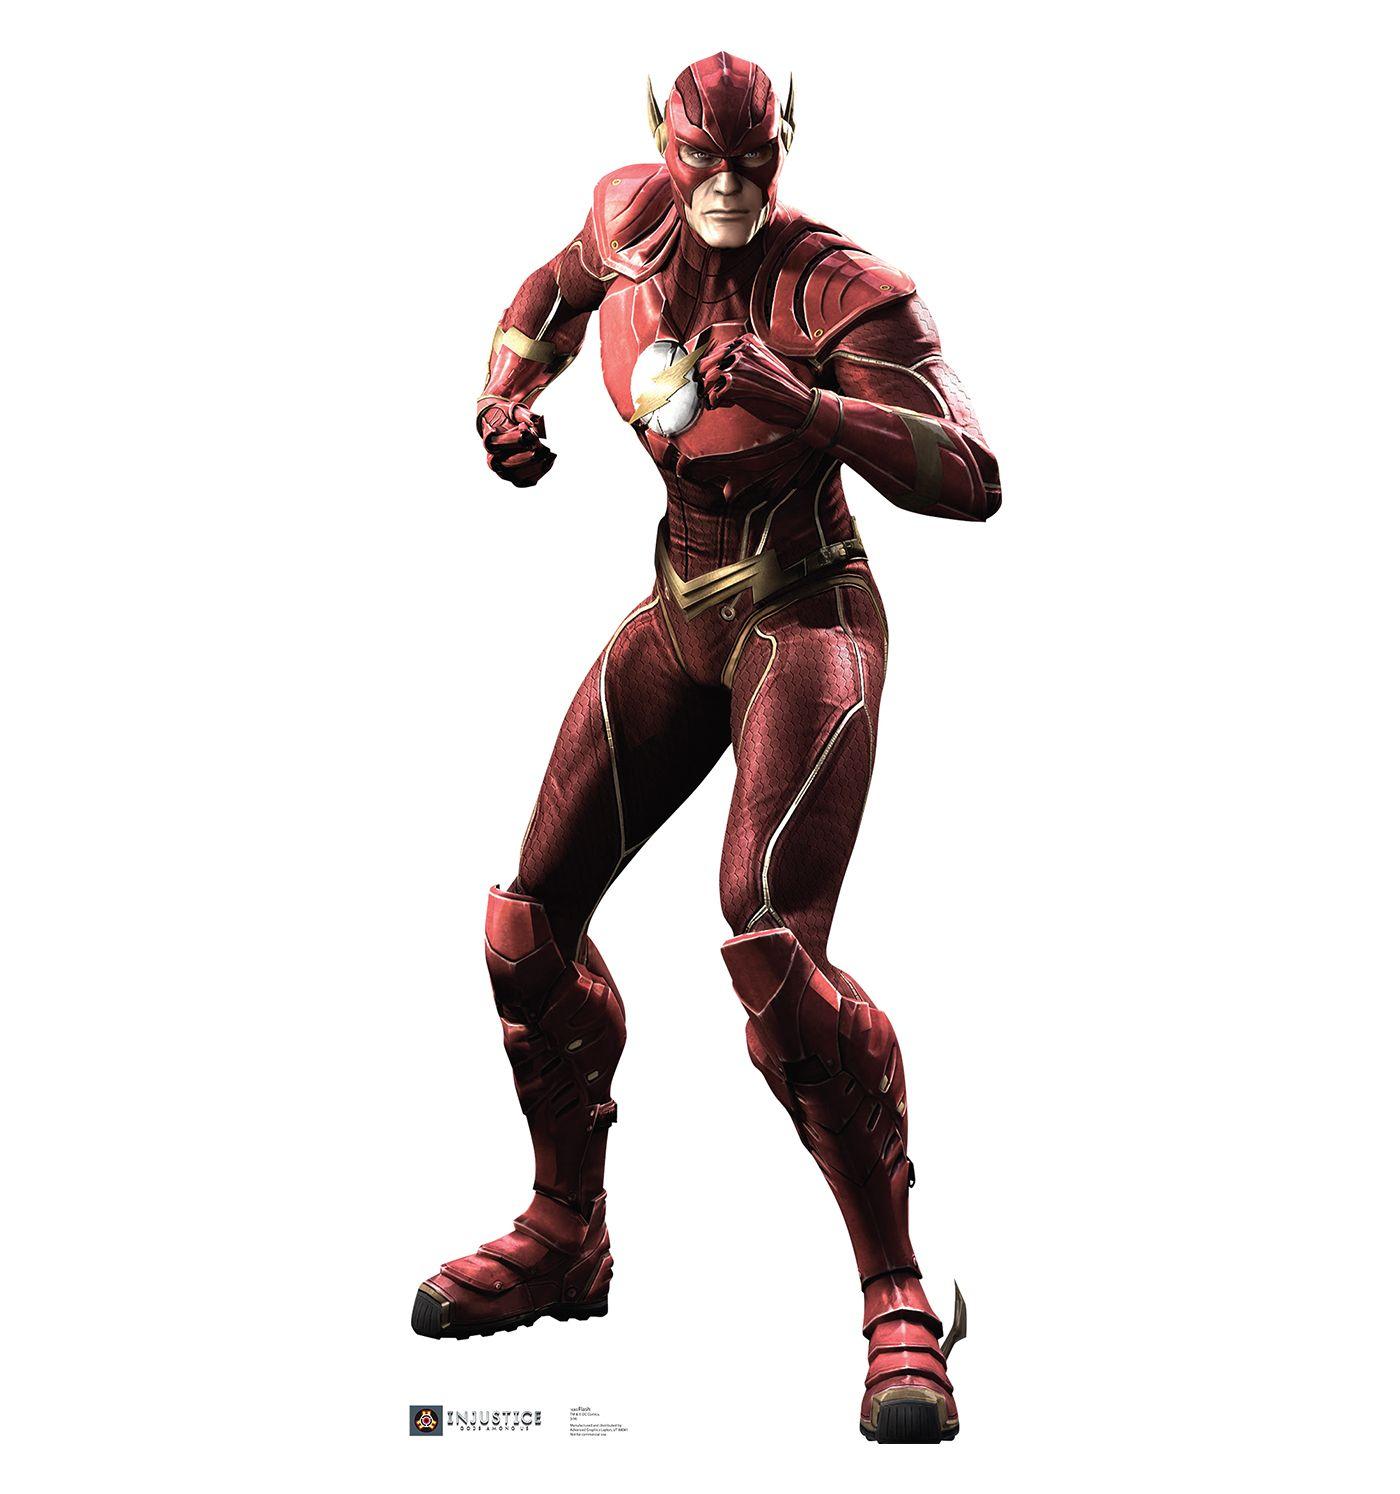 Flash Injustice Gods Among Us Cardboard Cutout Dc Comics Games The Flash Injustice